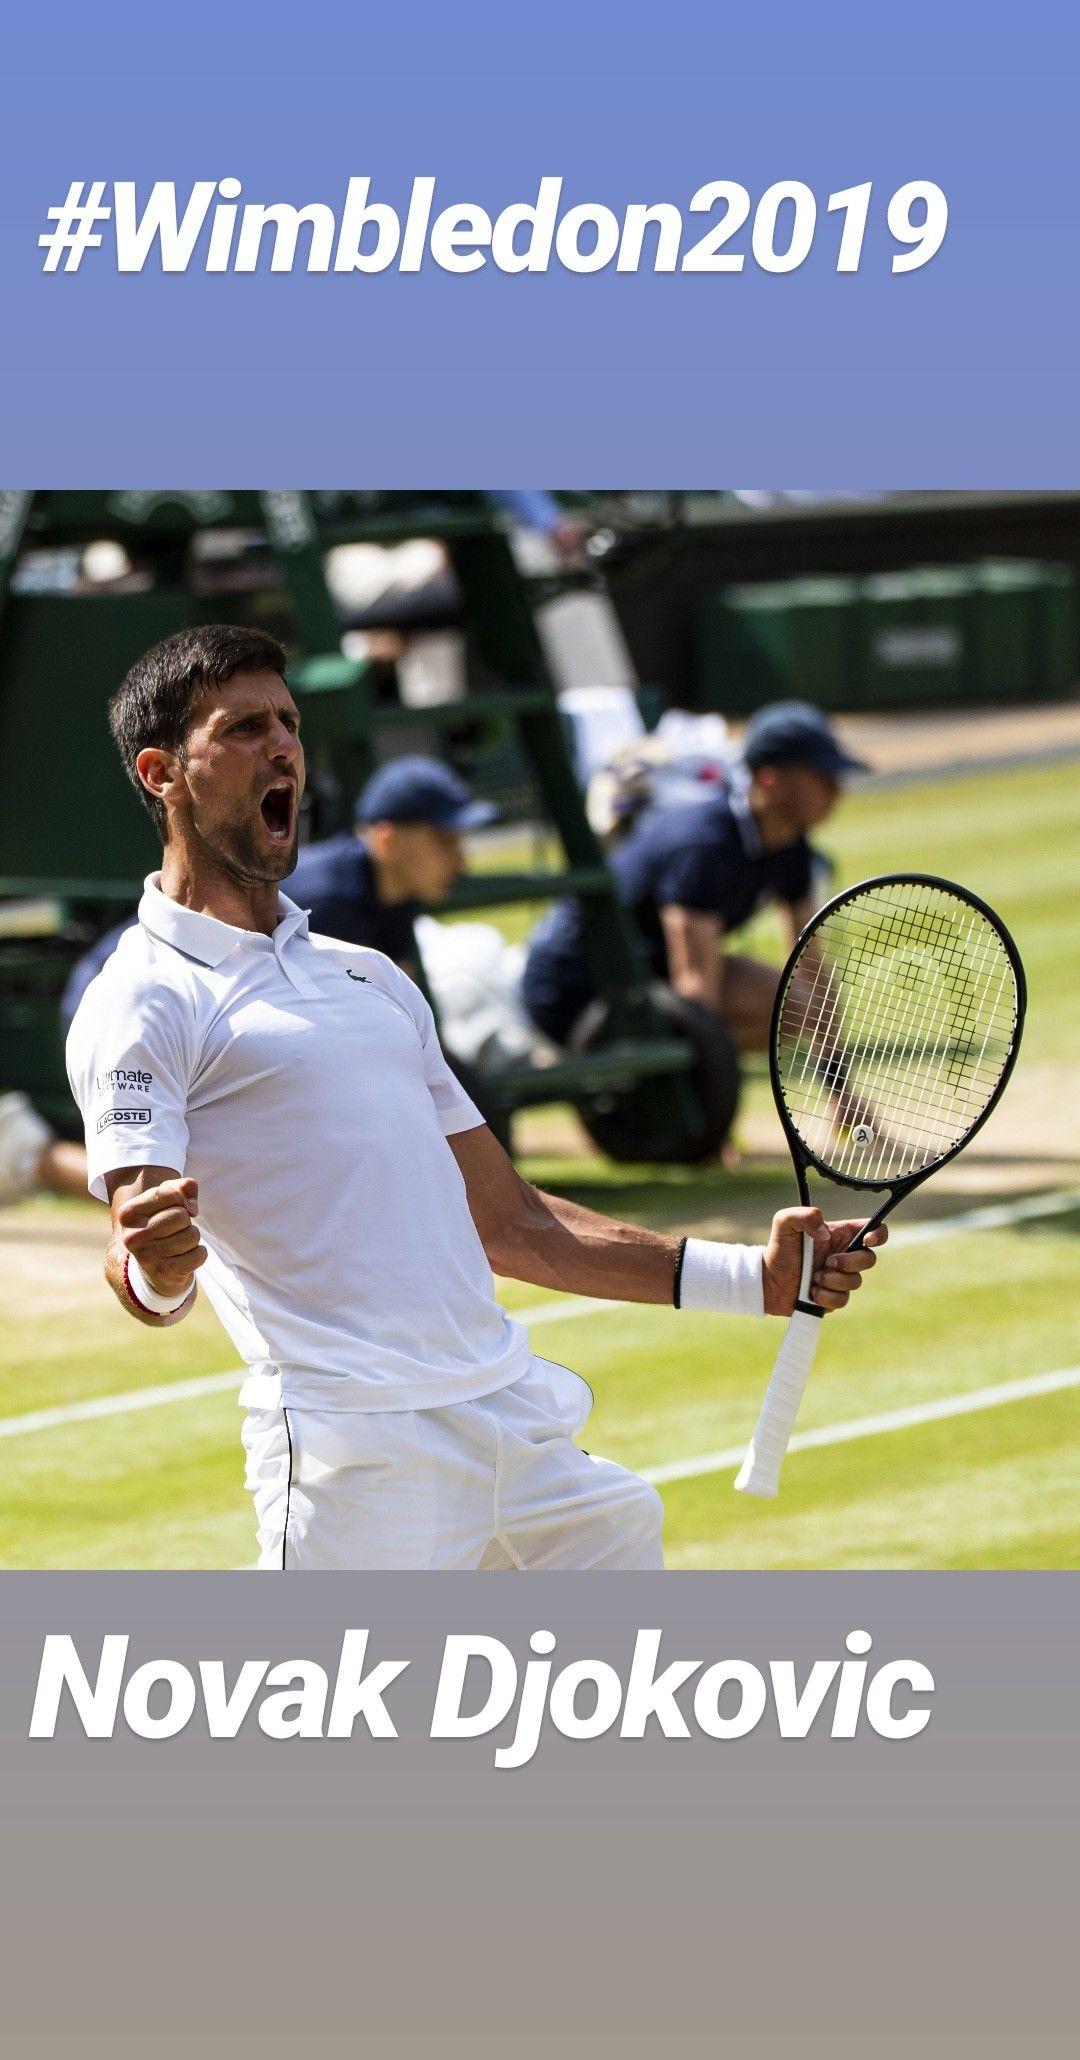 Novak Djokovic Save Two Match Points And Wins His Fifth Wimbledon Title With A 7 6 7 5 1 6 7 6 7 4 4 6 12 12 7 3 Victory Novak Djokovic Match Point Tennis